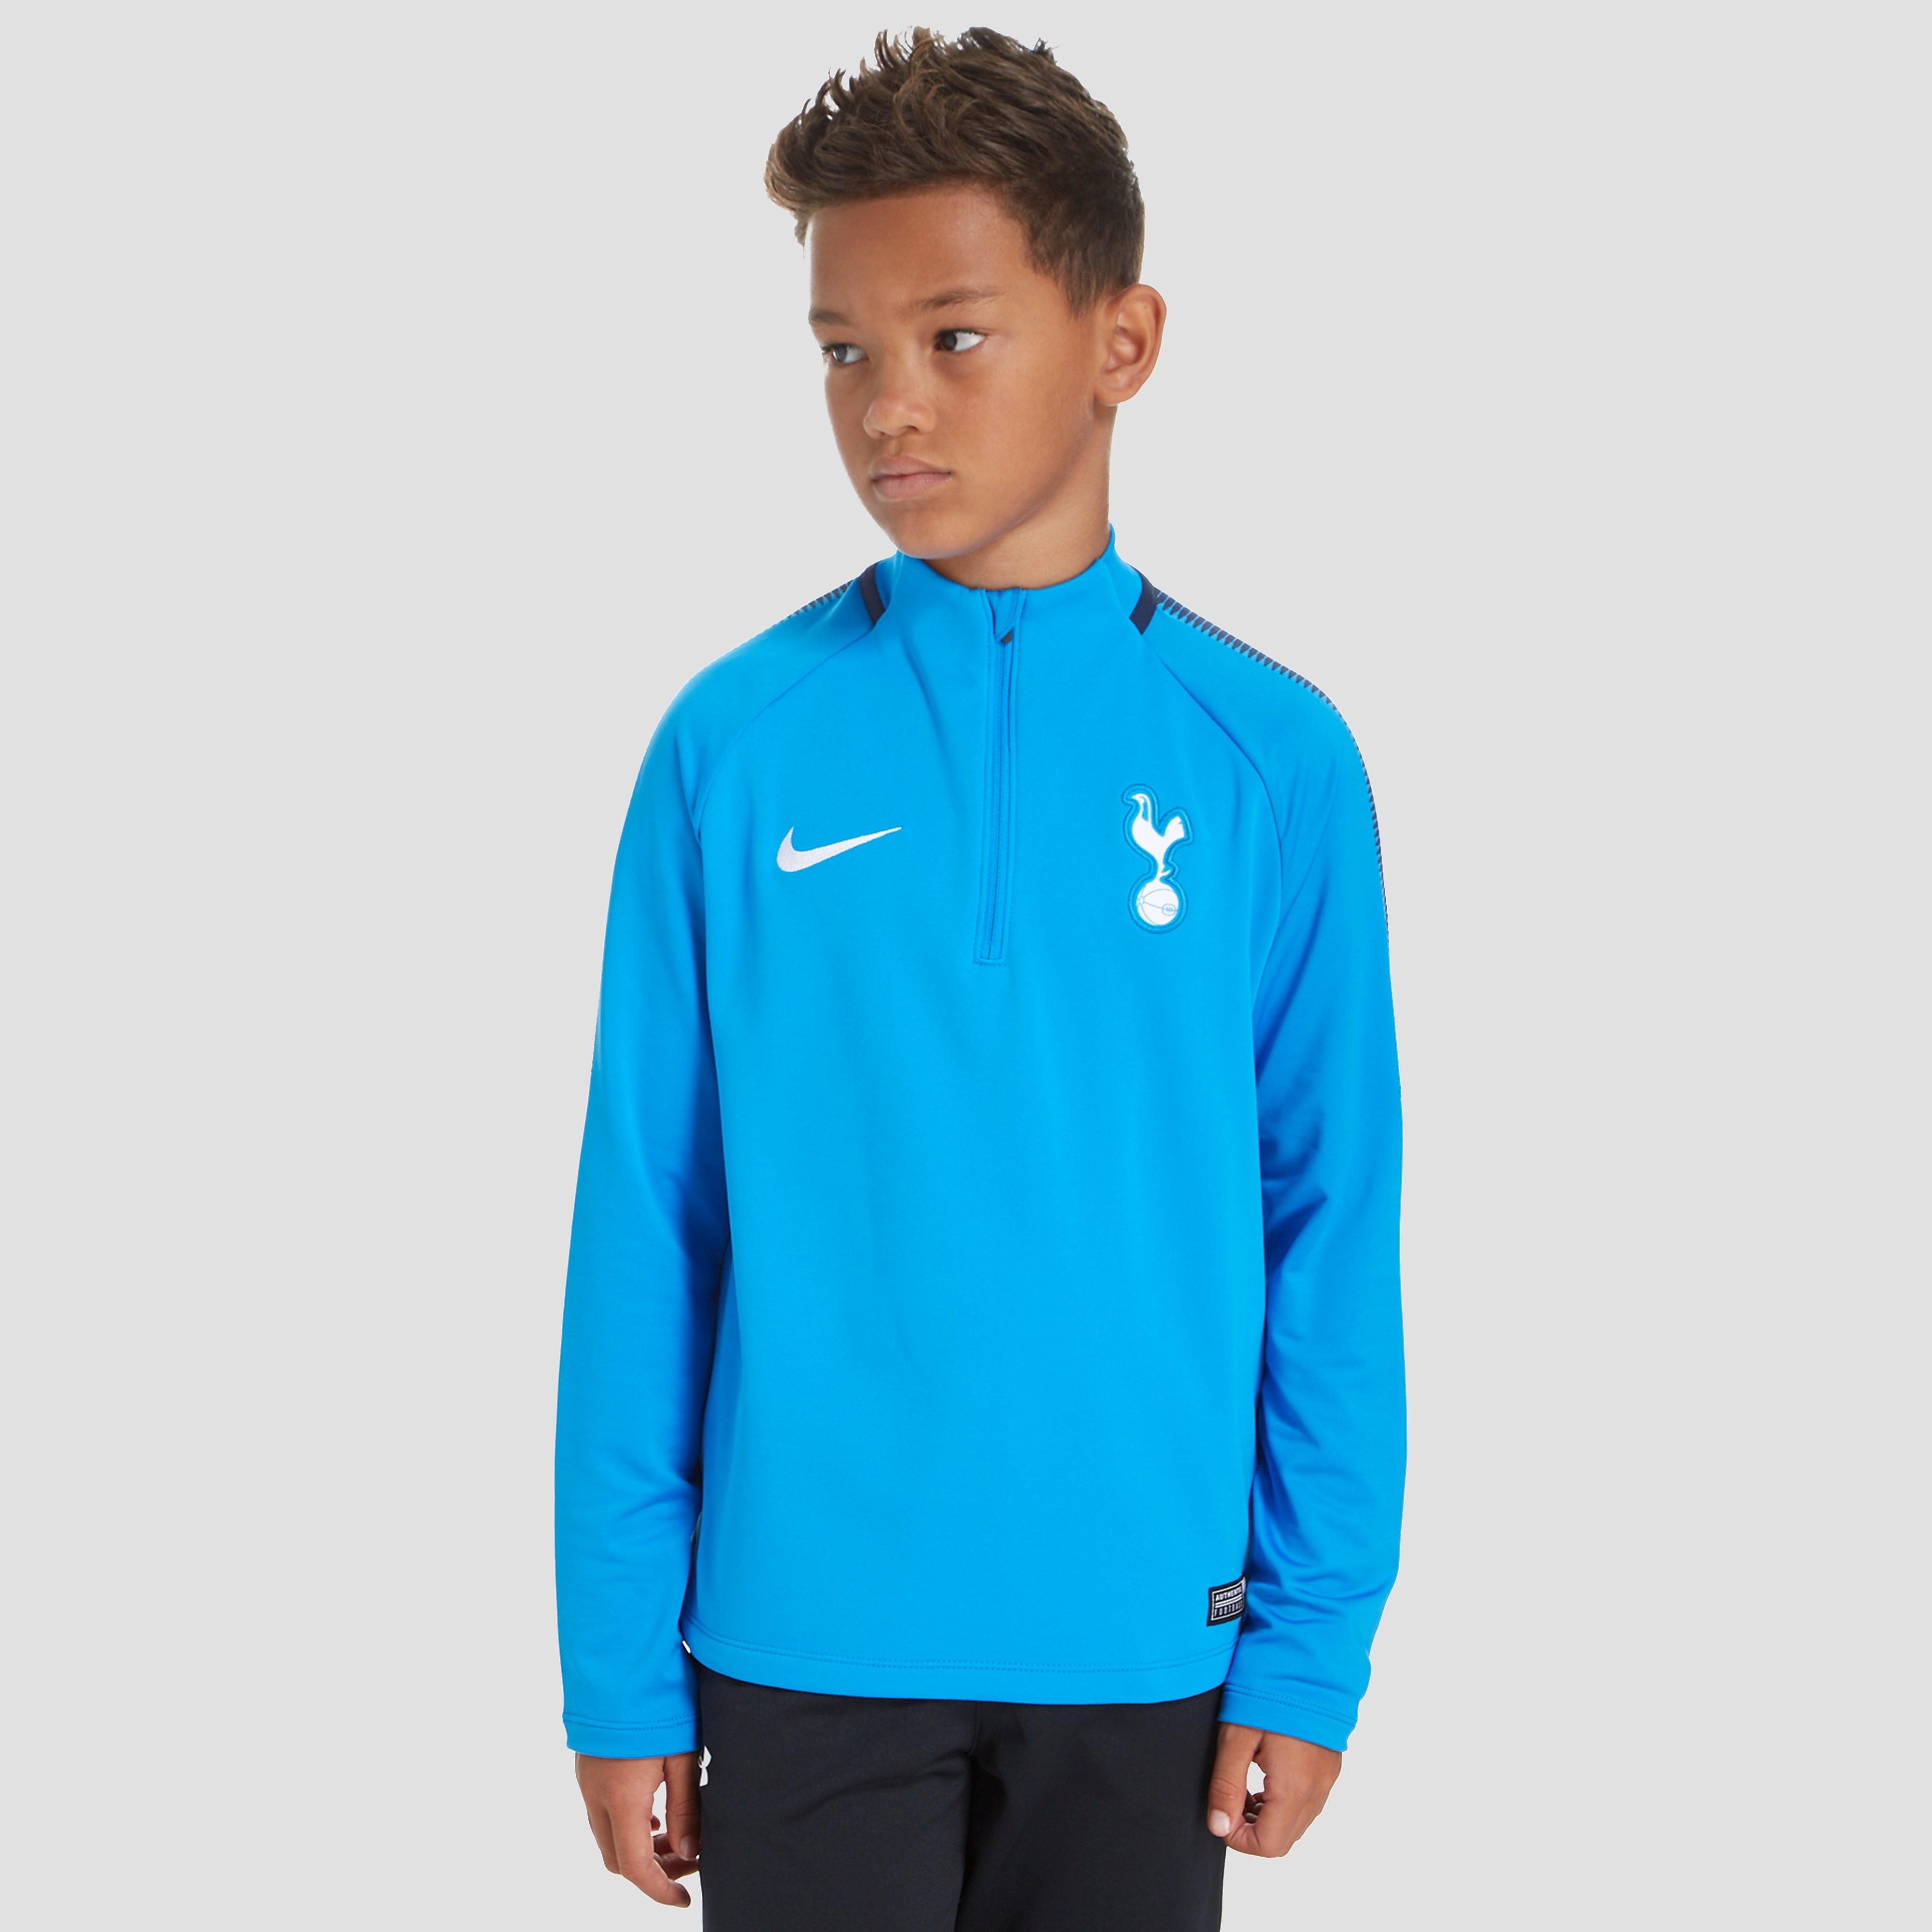 Nike Tottenham Hotspur 2017 Squad Drill Top Junionr